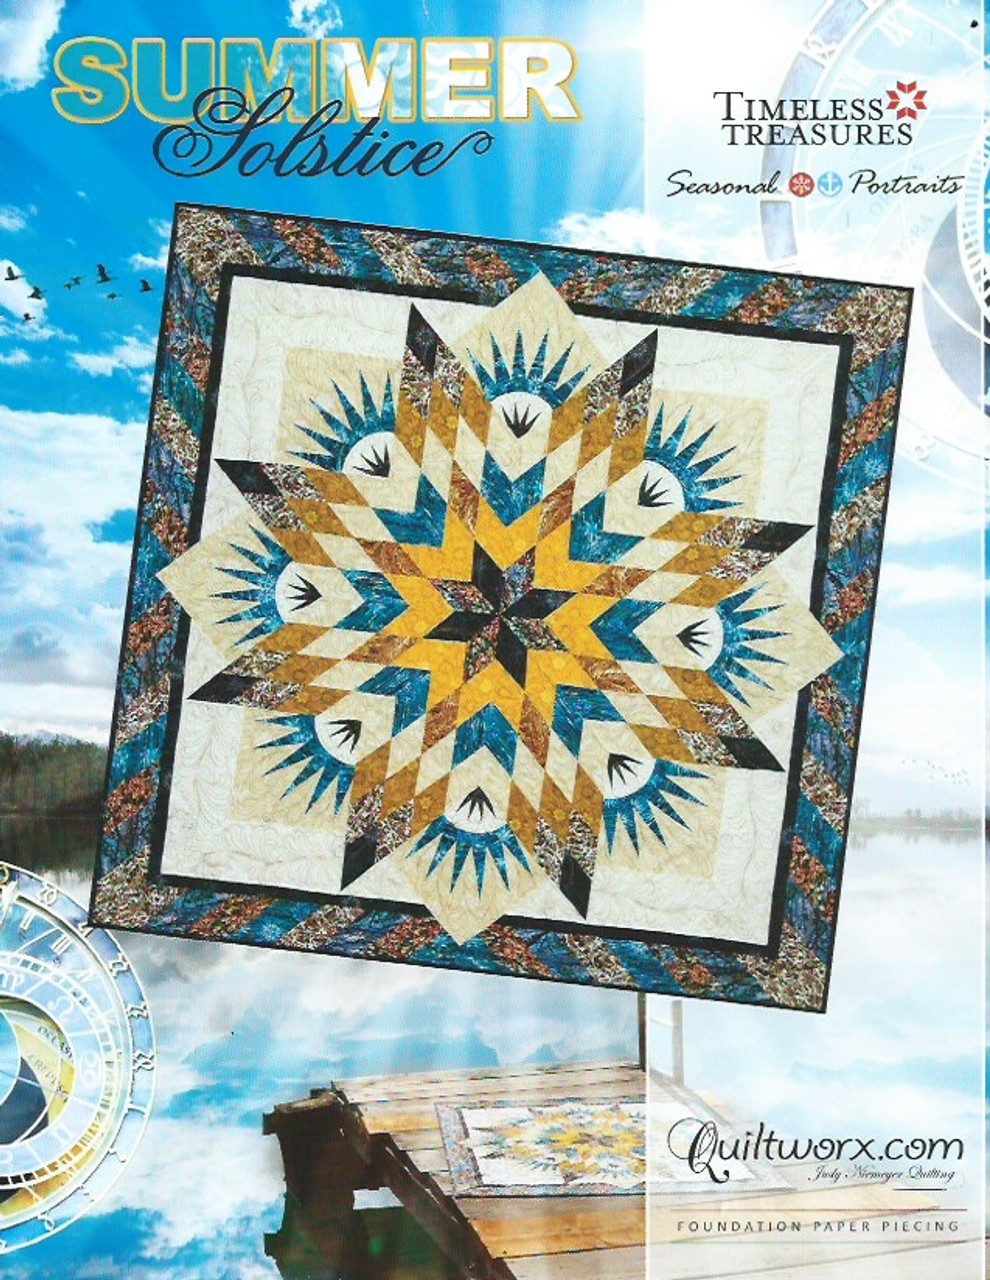 Foundation Paper Piecing Quilt Pattern ~ SEA URCHINS ~ by Judy Niemeyer